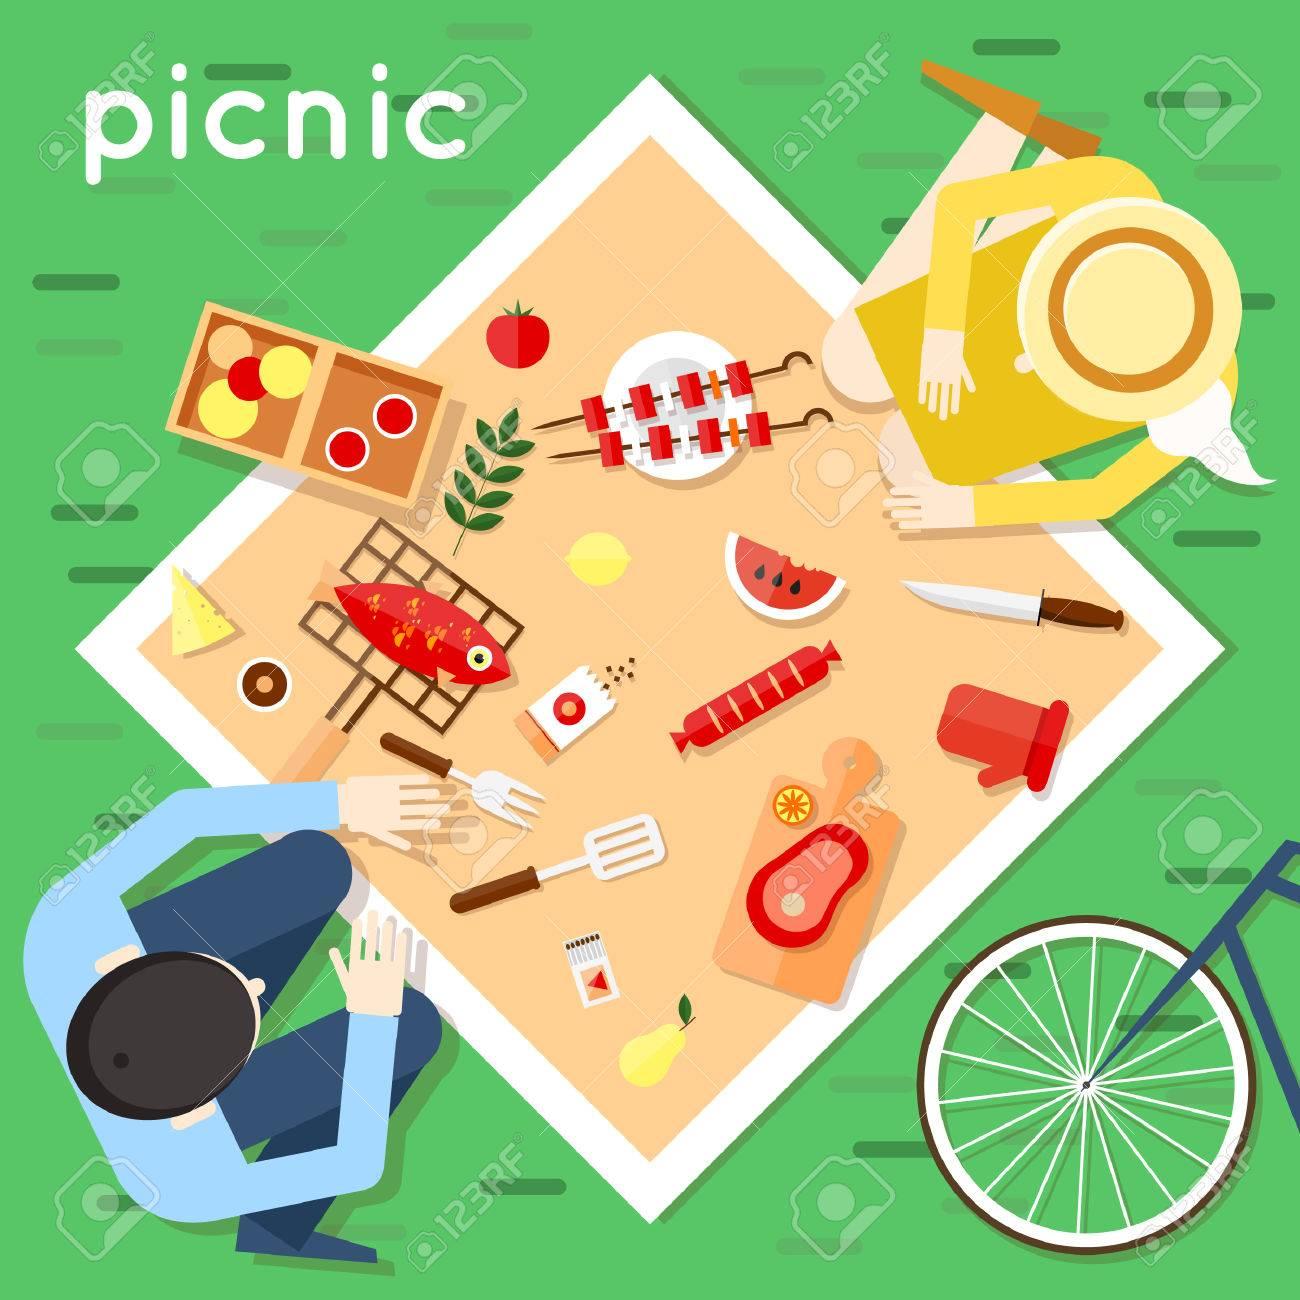 15,047 Picnic Food Cliparts, Stock Vector And Royalty Free Picnic ...